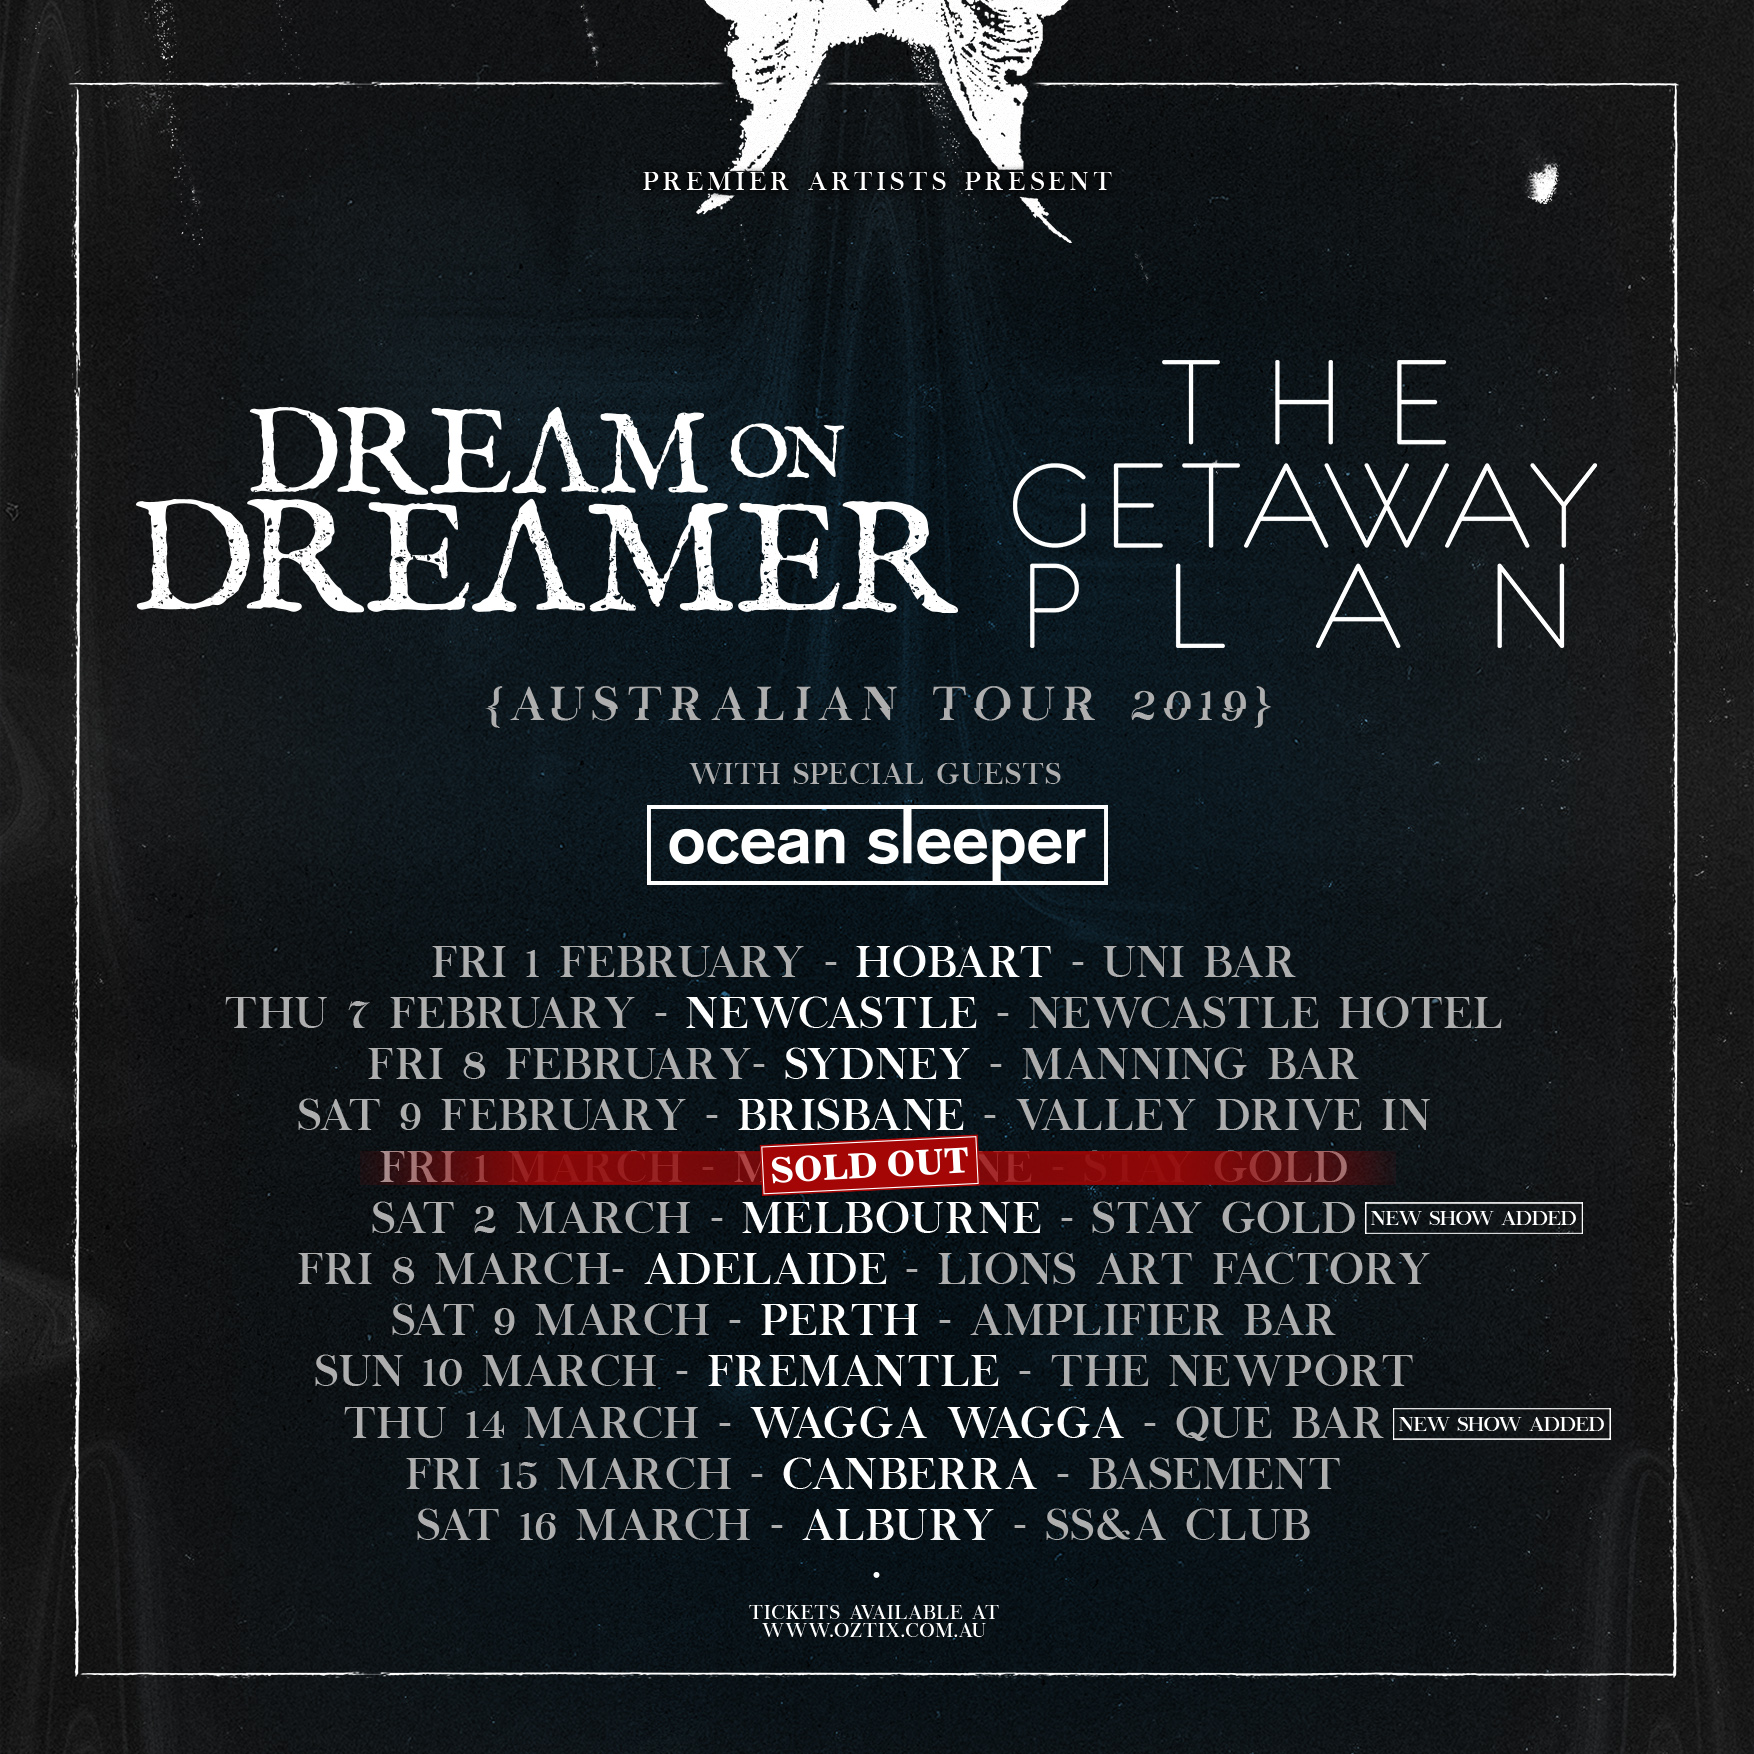 Getaway_Dreamer_Tour_square.jpg